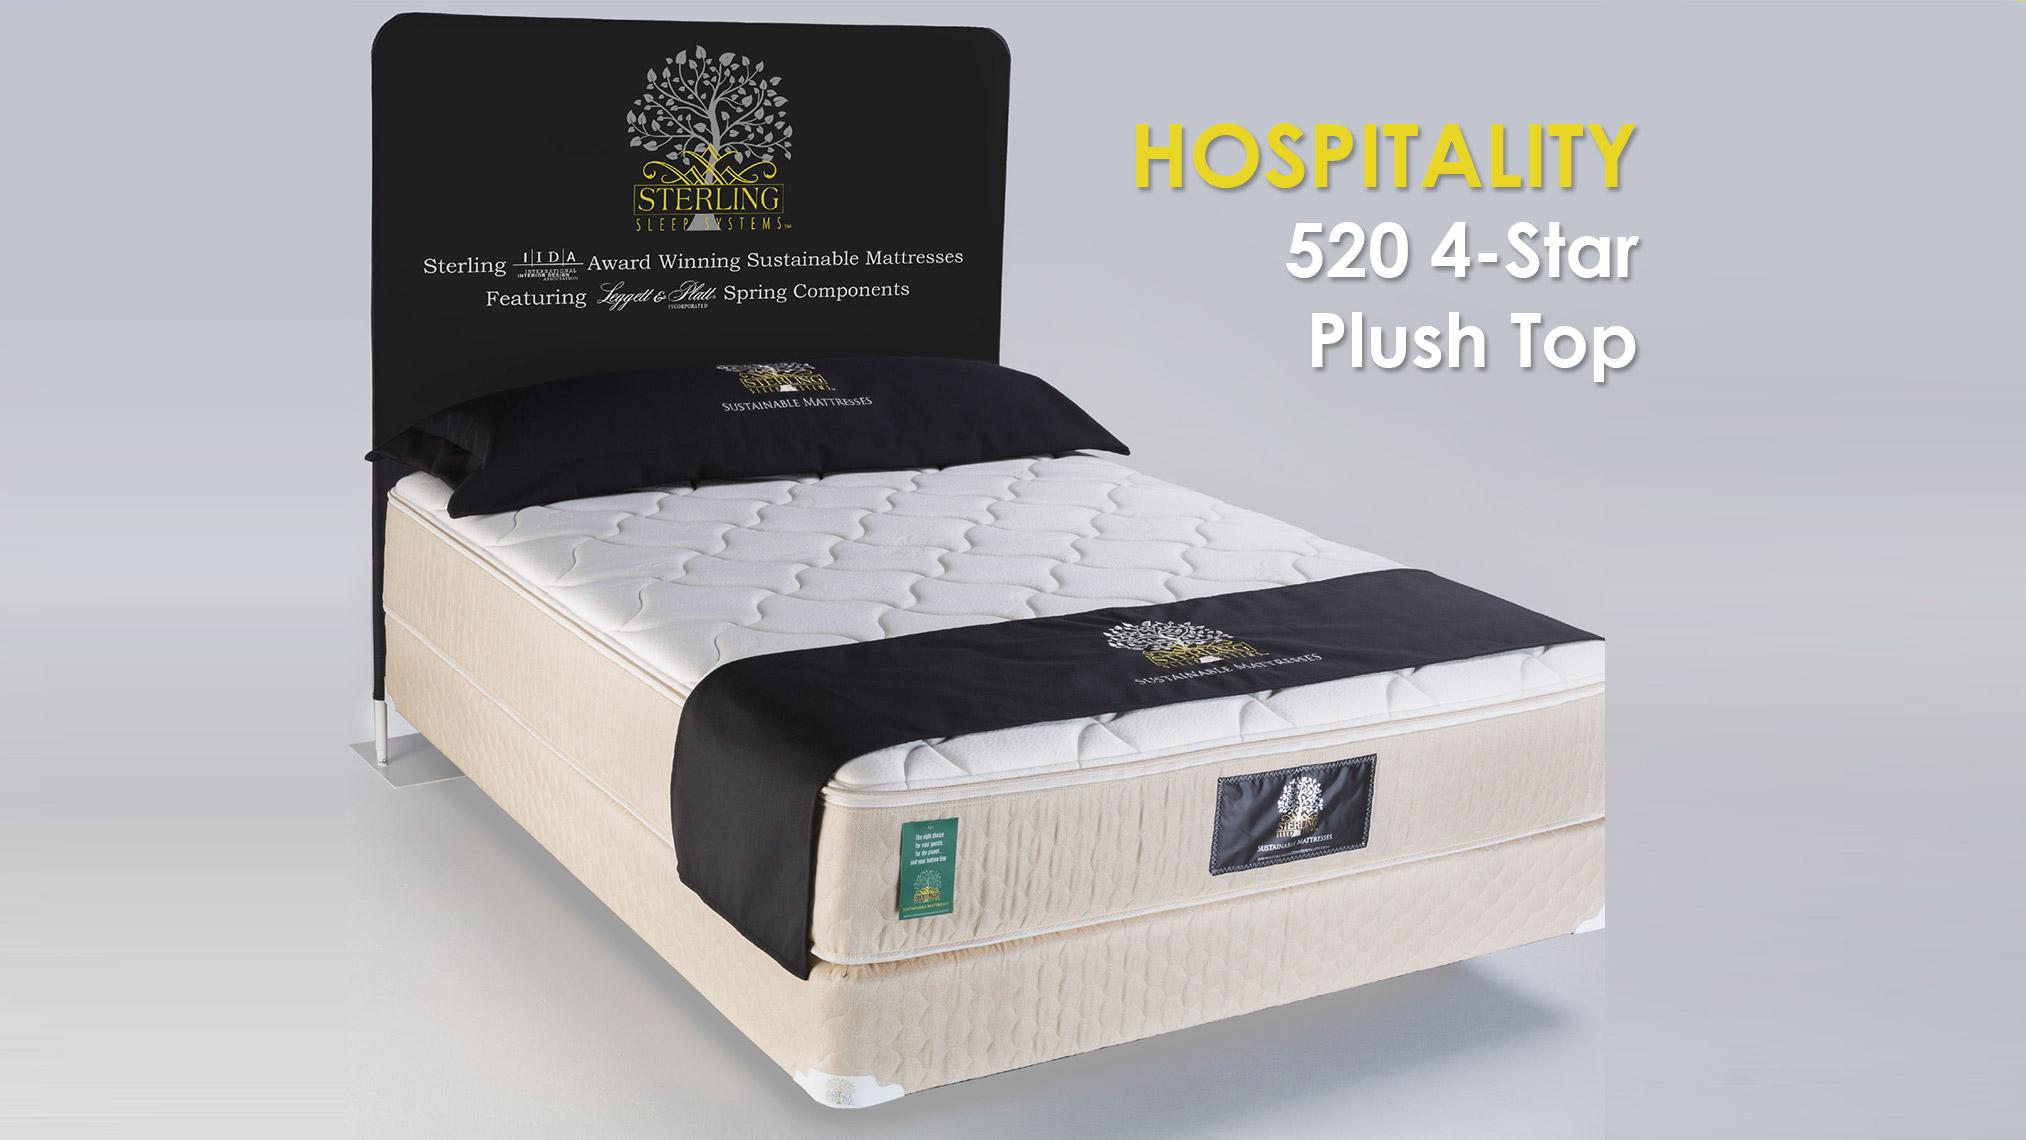 hospitality 520 4-star plush top mattress